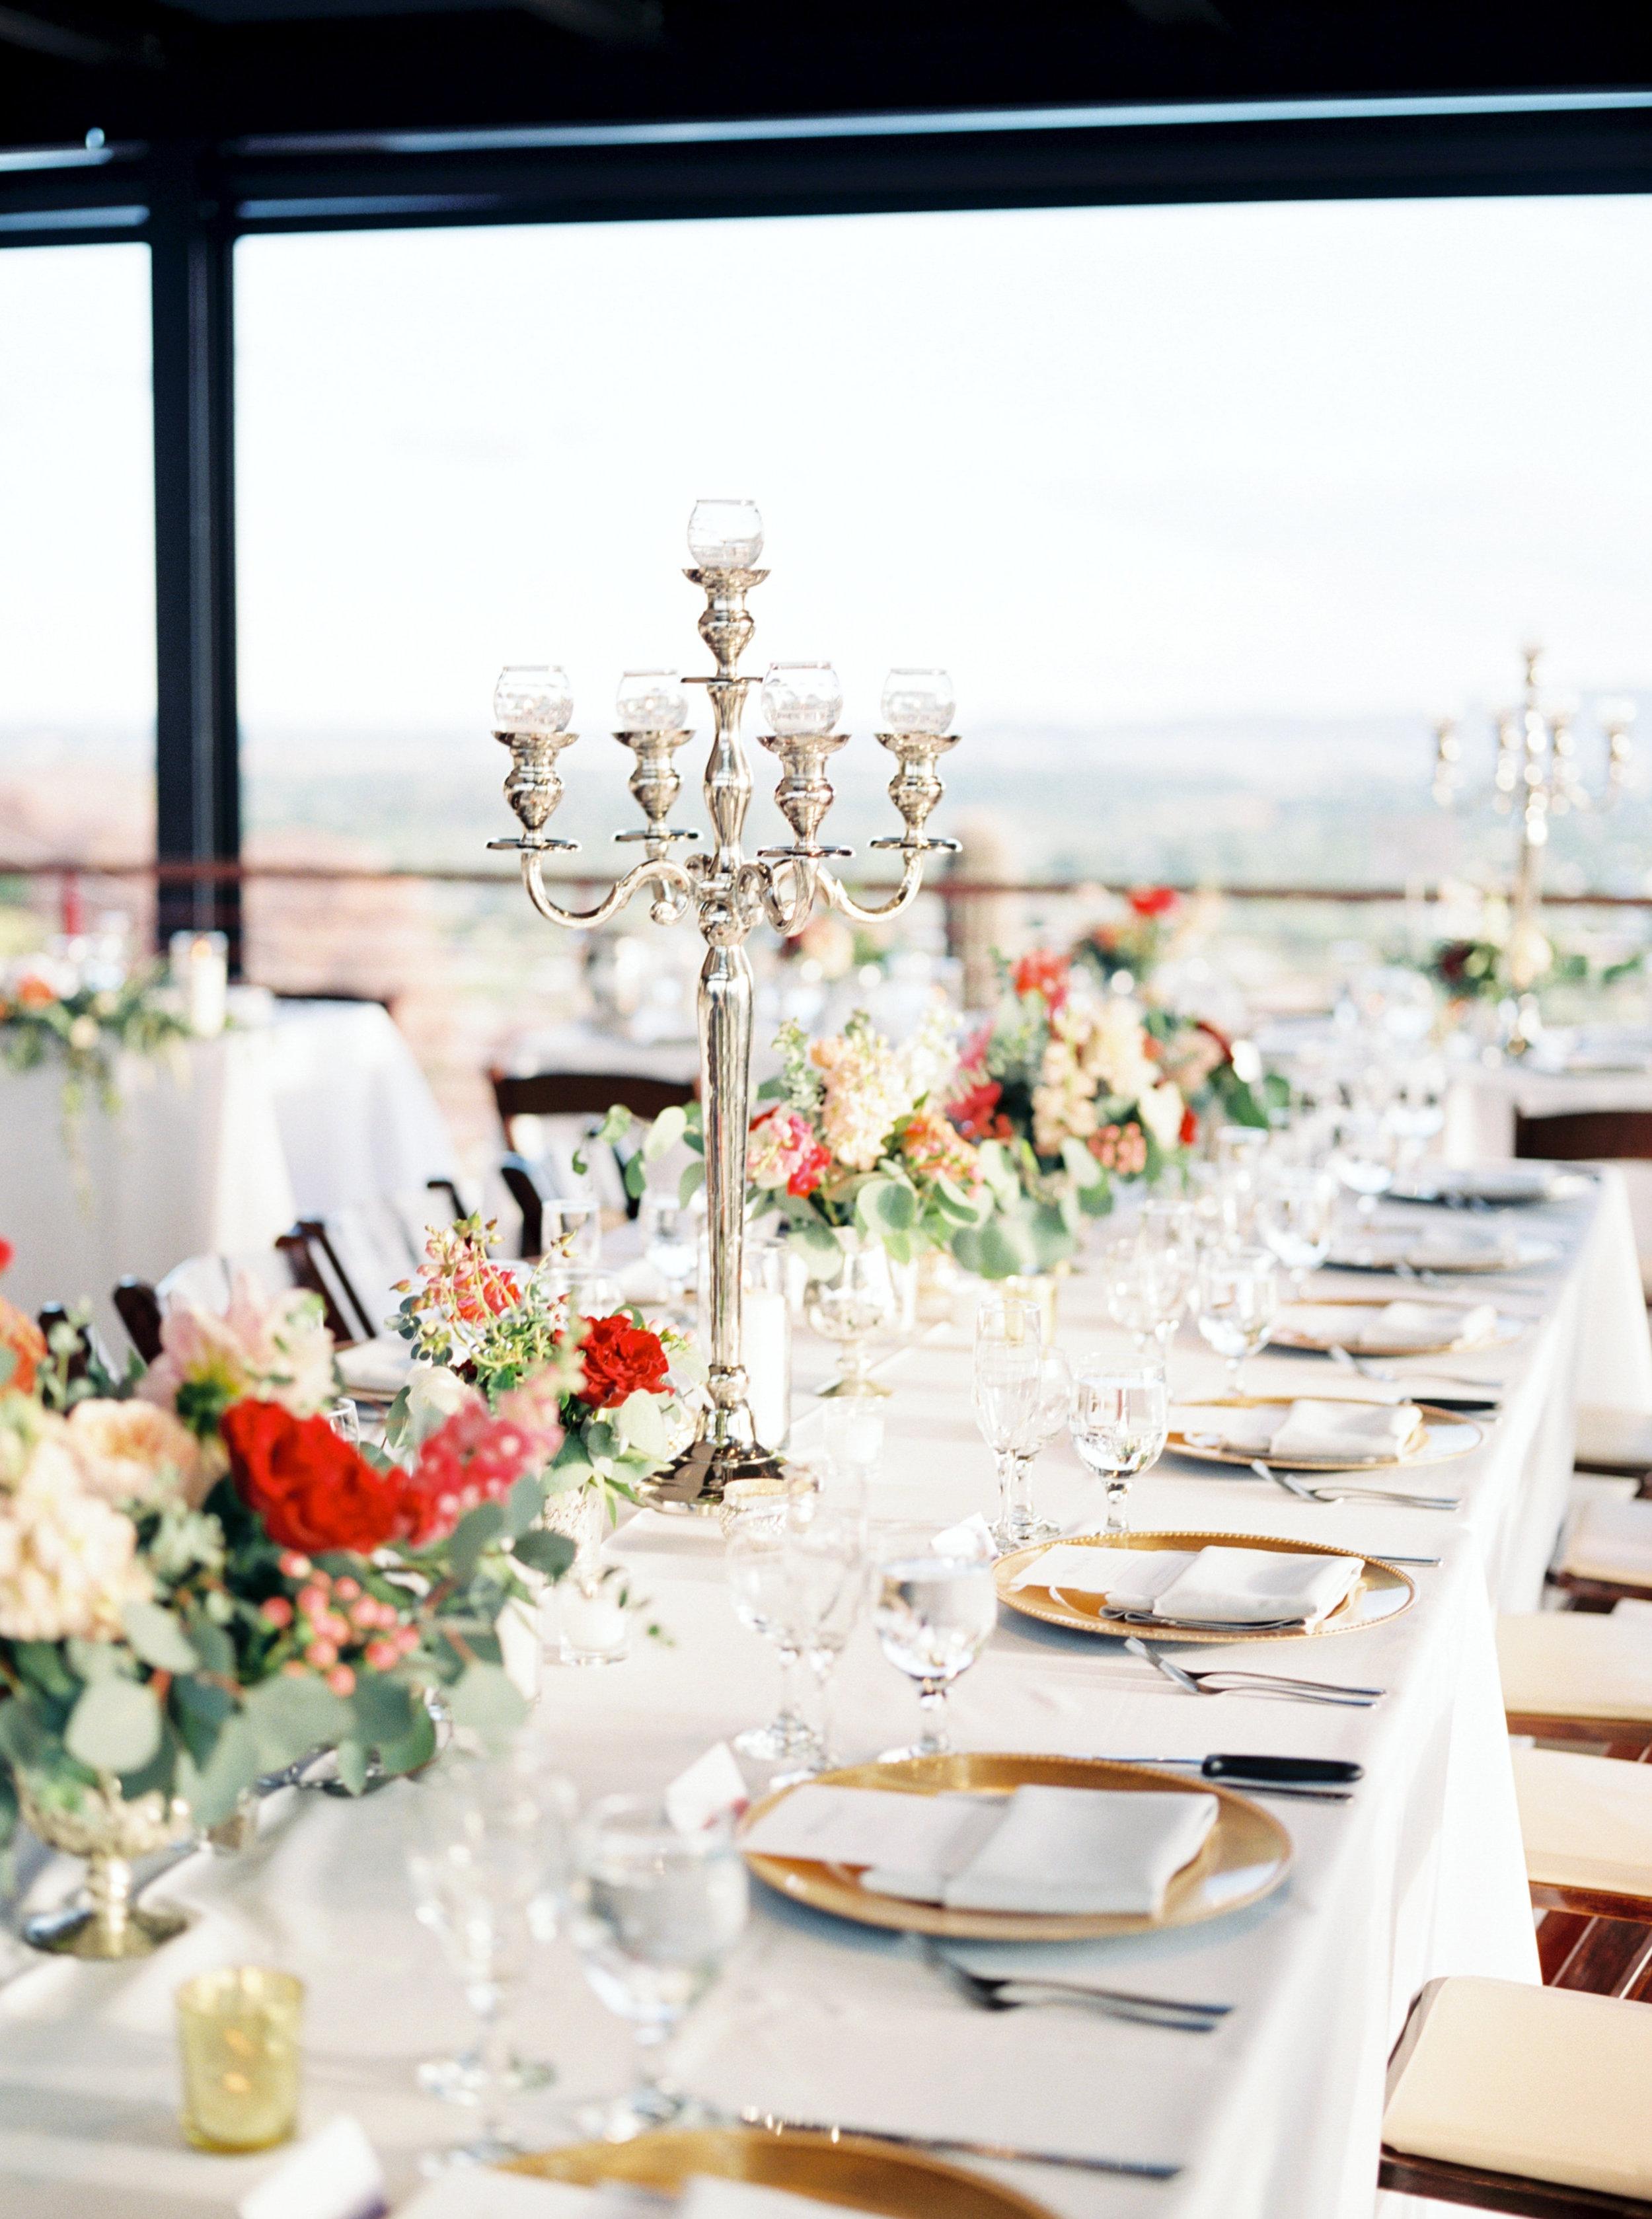 wedding centerpiece, white wedding linens, gold chargers, garden wedding flowers, red wedding flowers, peach wedding flowers, ivory wedding flowers, blush wedding flowers, silver candleabras